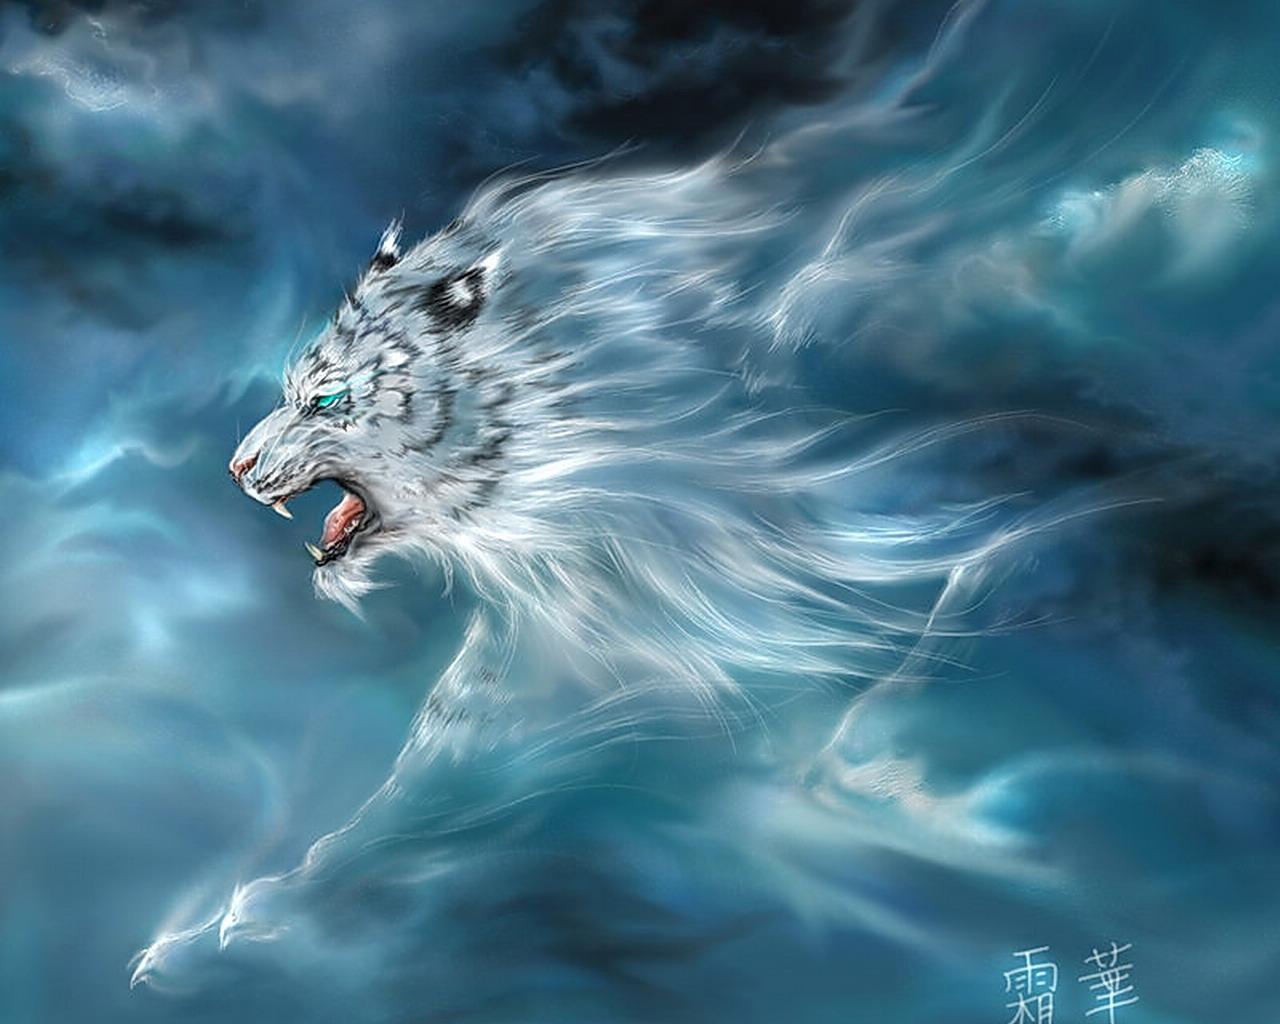 White tiger beautiful tiger hd tiger images sleeping tiger - White tiger wallpaper free download ...